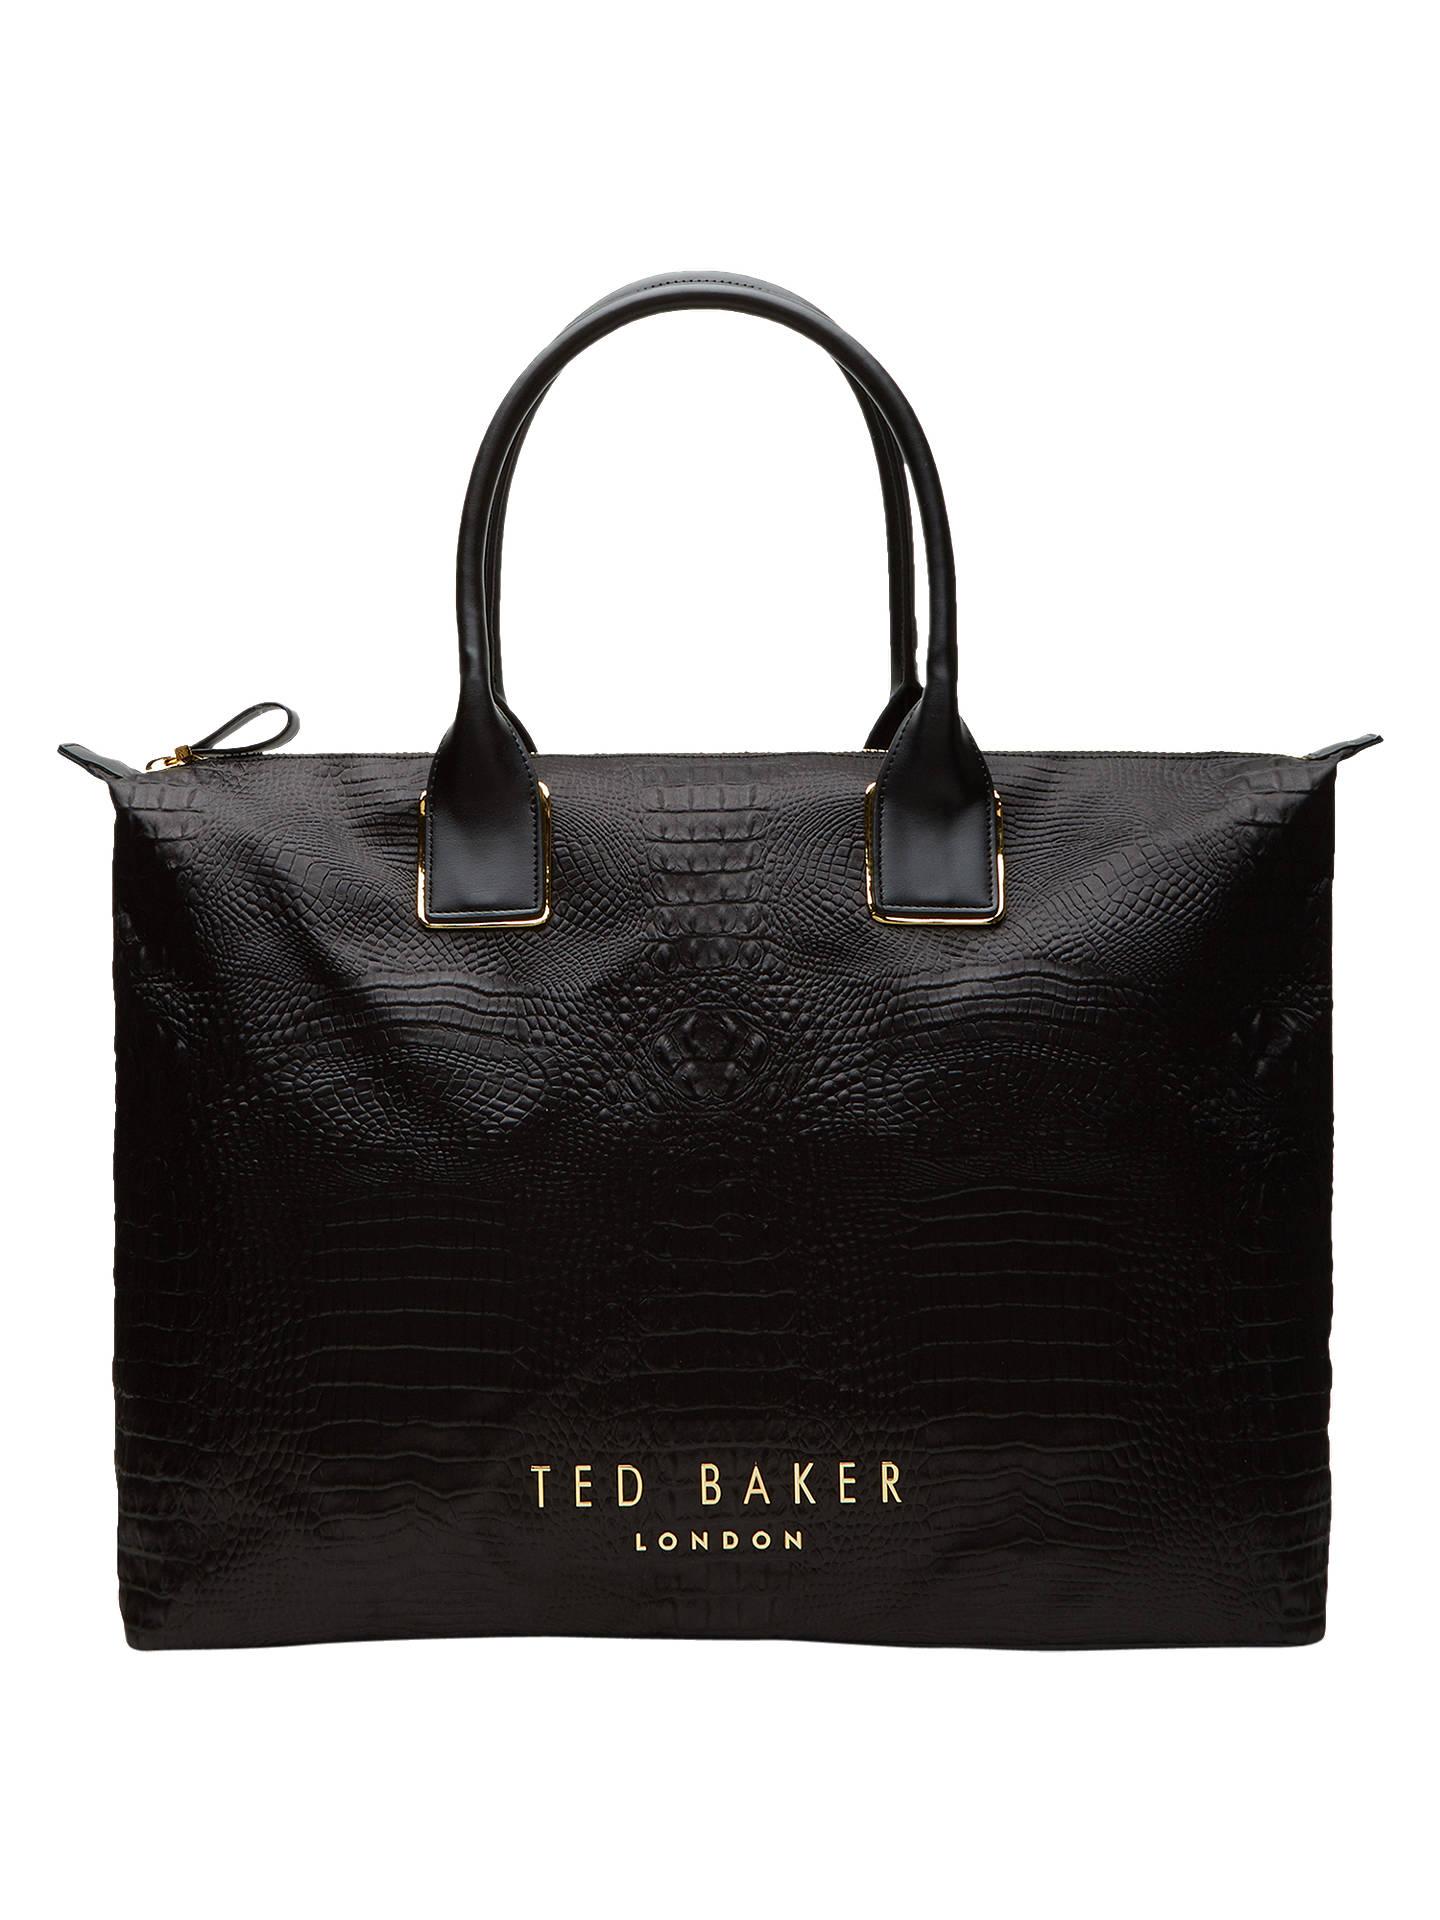 5888a70fa4db1c Buy Ted Baker Tori Exotic Large Tote Bag